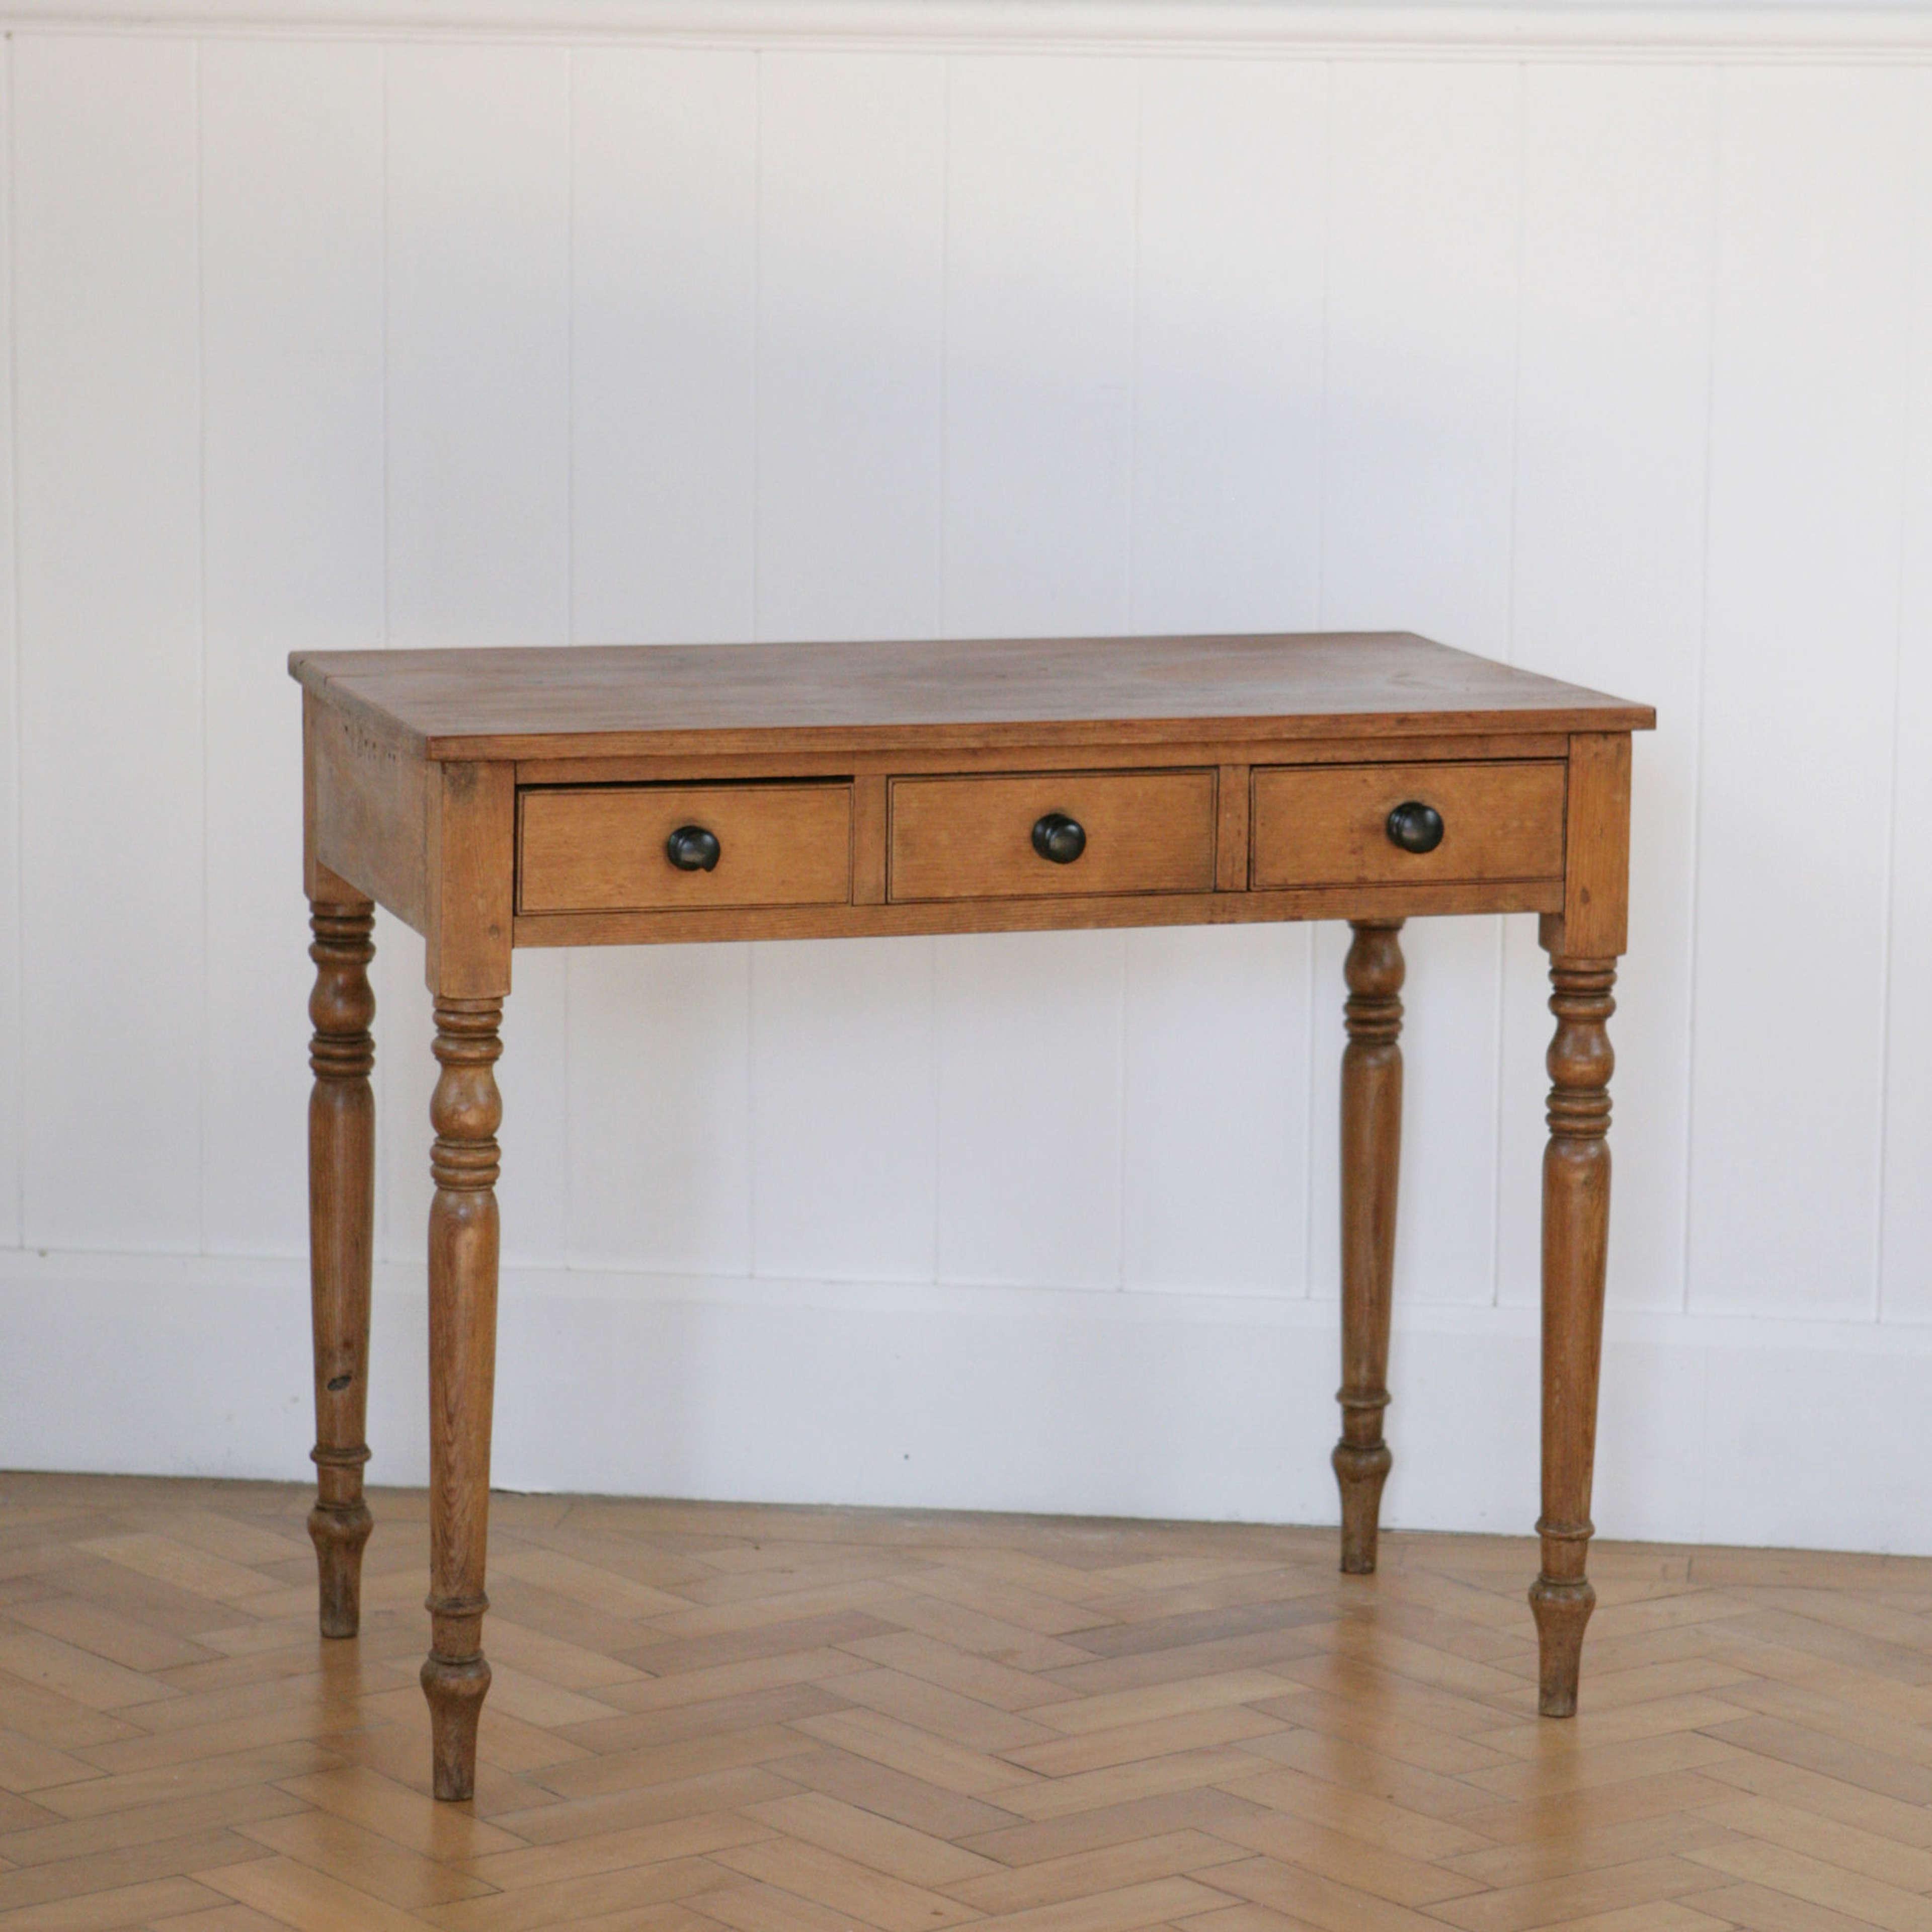 Decorative original pine side table.